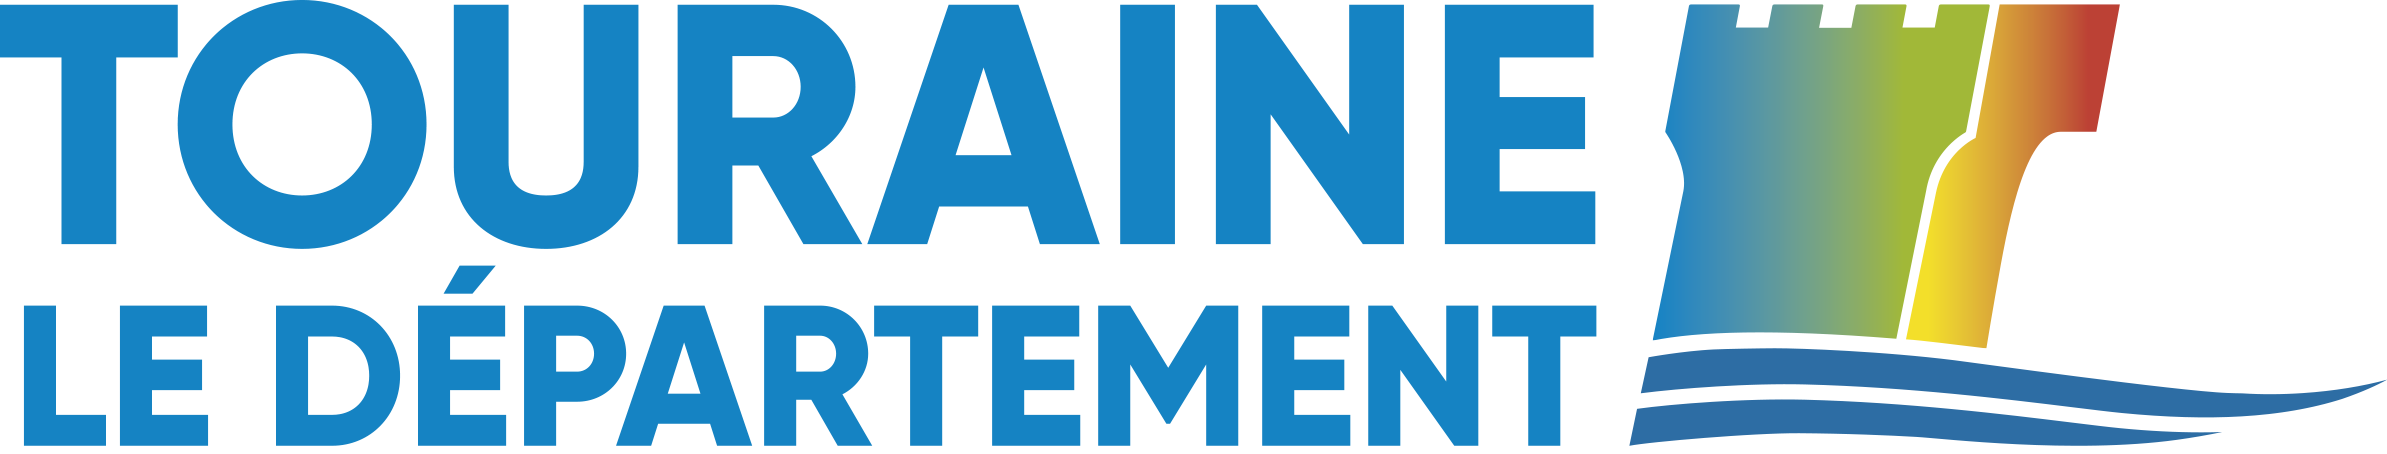 logo_touraine_dpt_bleu